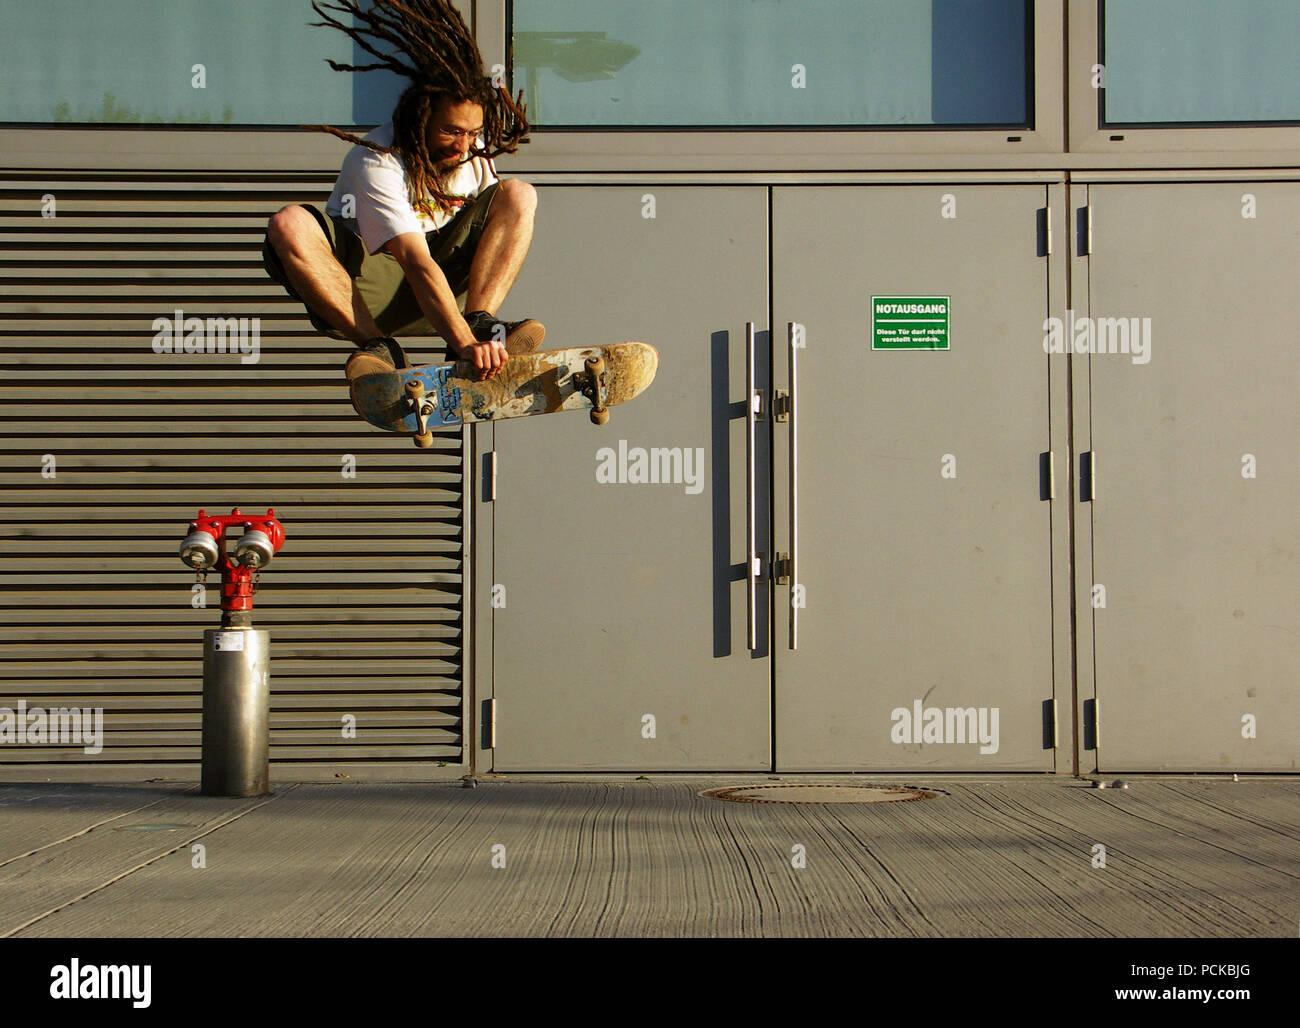 lifestyle,skater,jump,skating - Stock Image